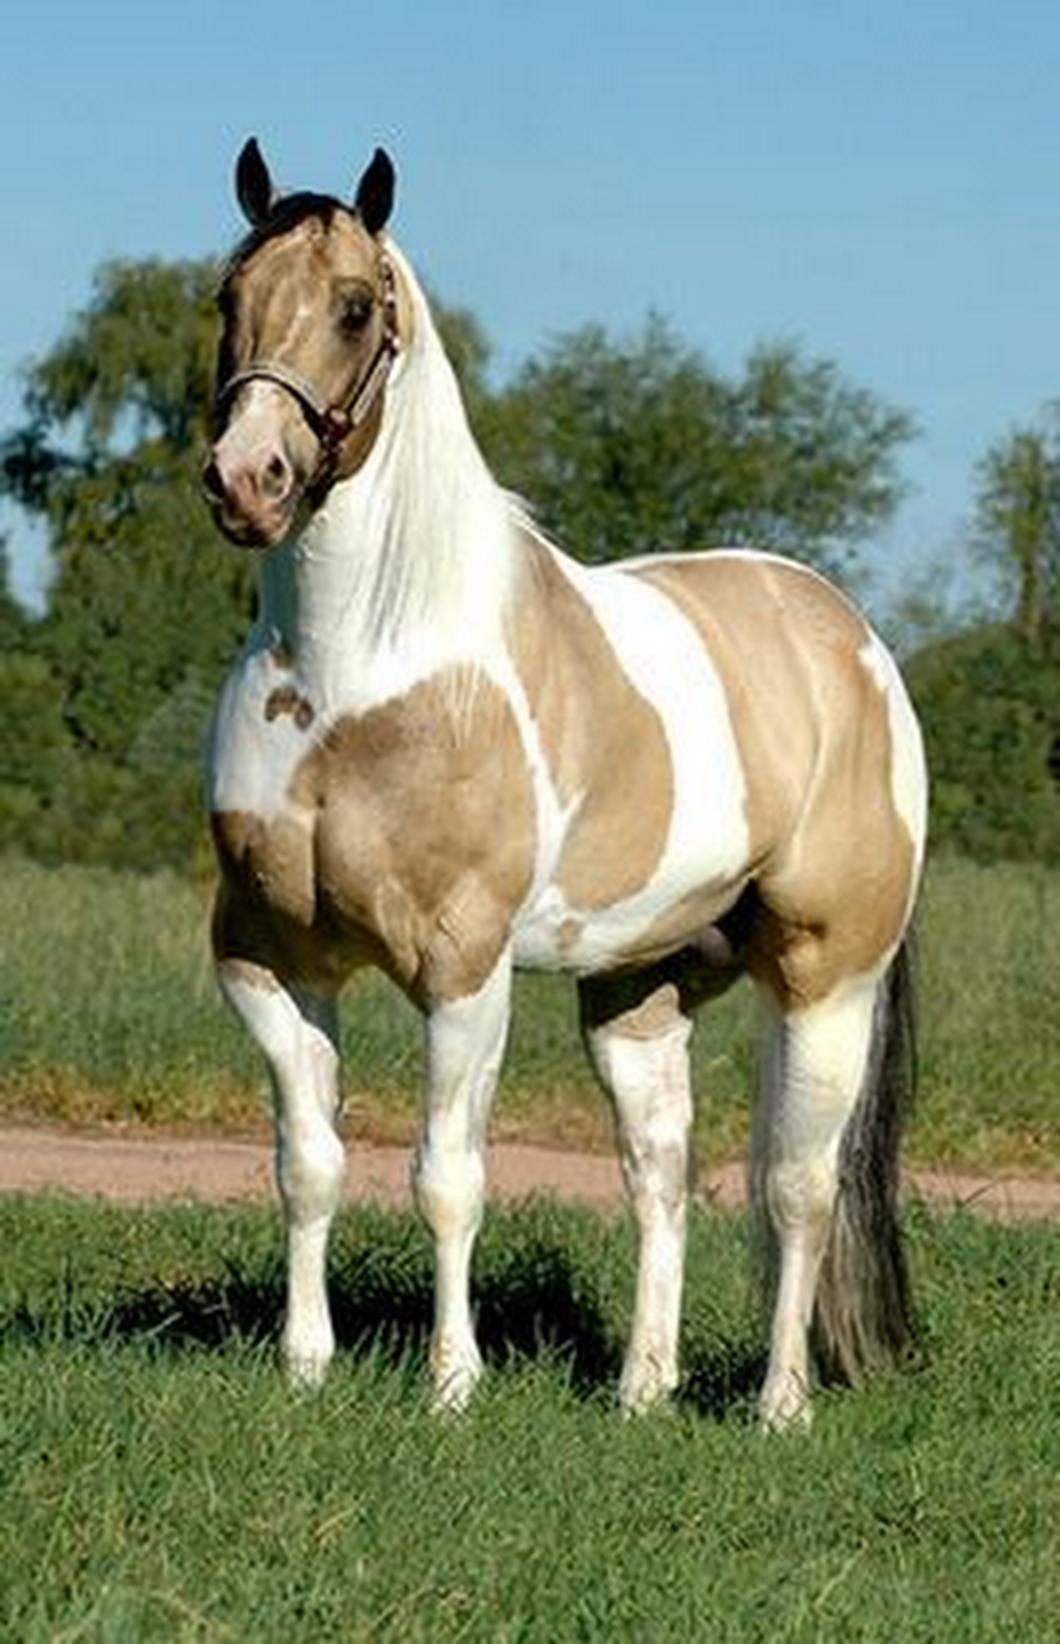 Showgirl Glitz : Photo | Horses, Quarter horse, Animal science